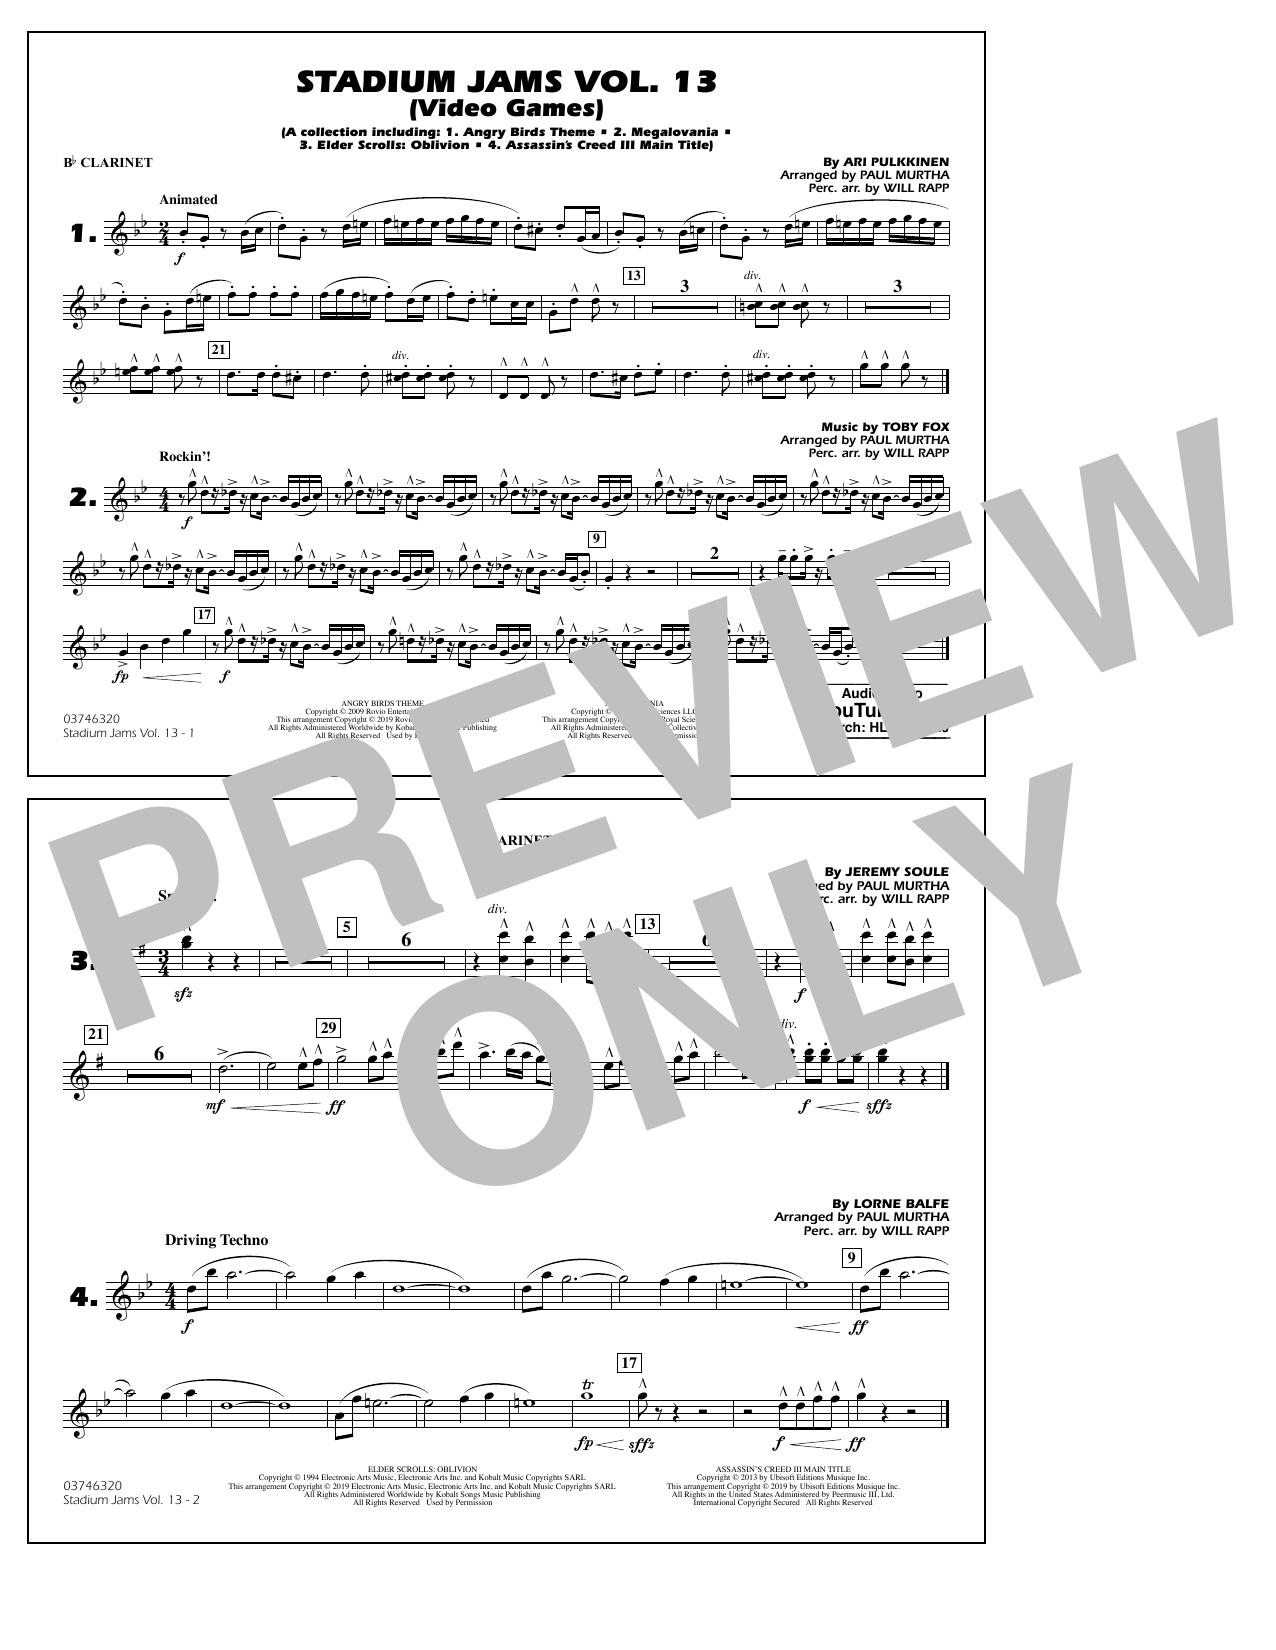 Stadium Jams Volume 13 (Video Games) - Bb Clarinet (Marching Band)